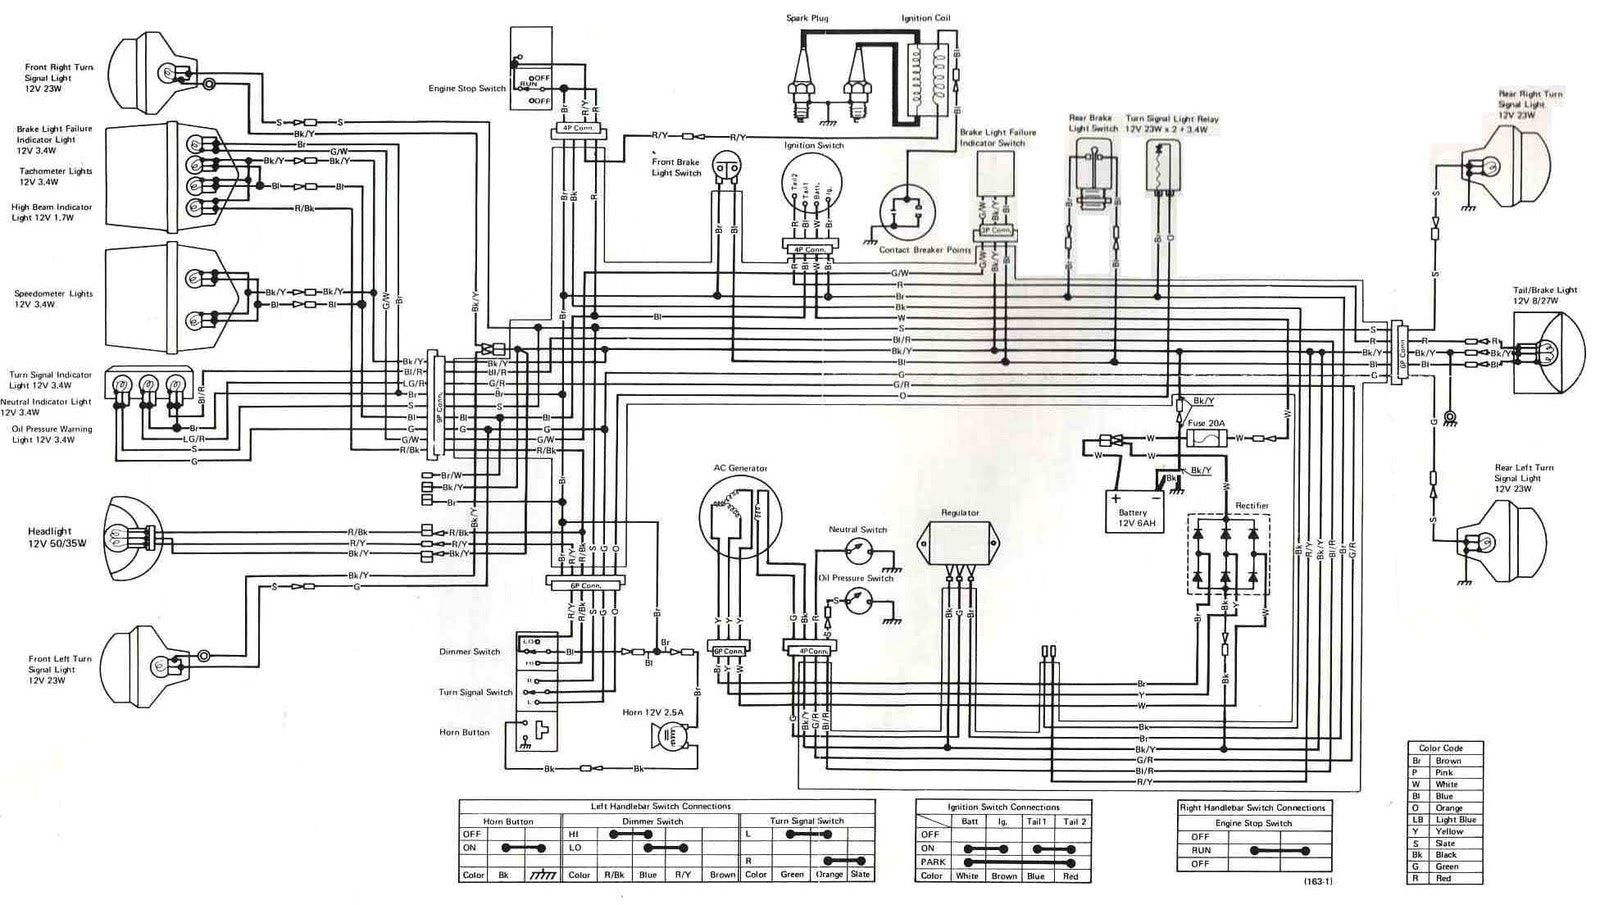 Kawasaki Klt 250 Wiring Diagram - Wiring Diagram & Cable ... on